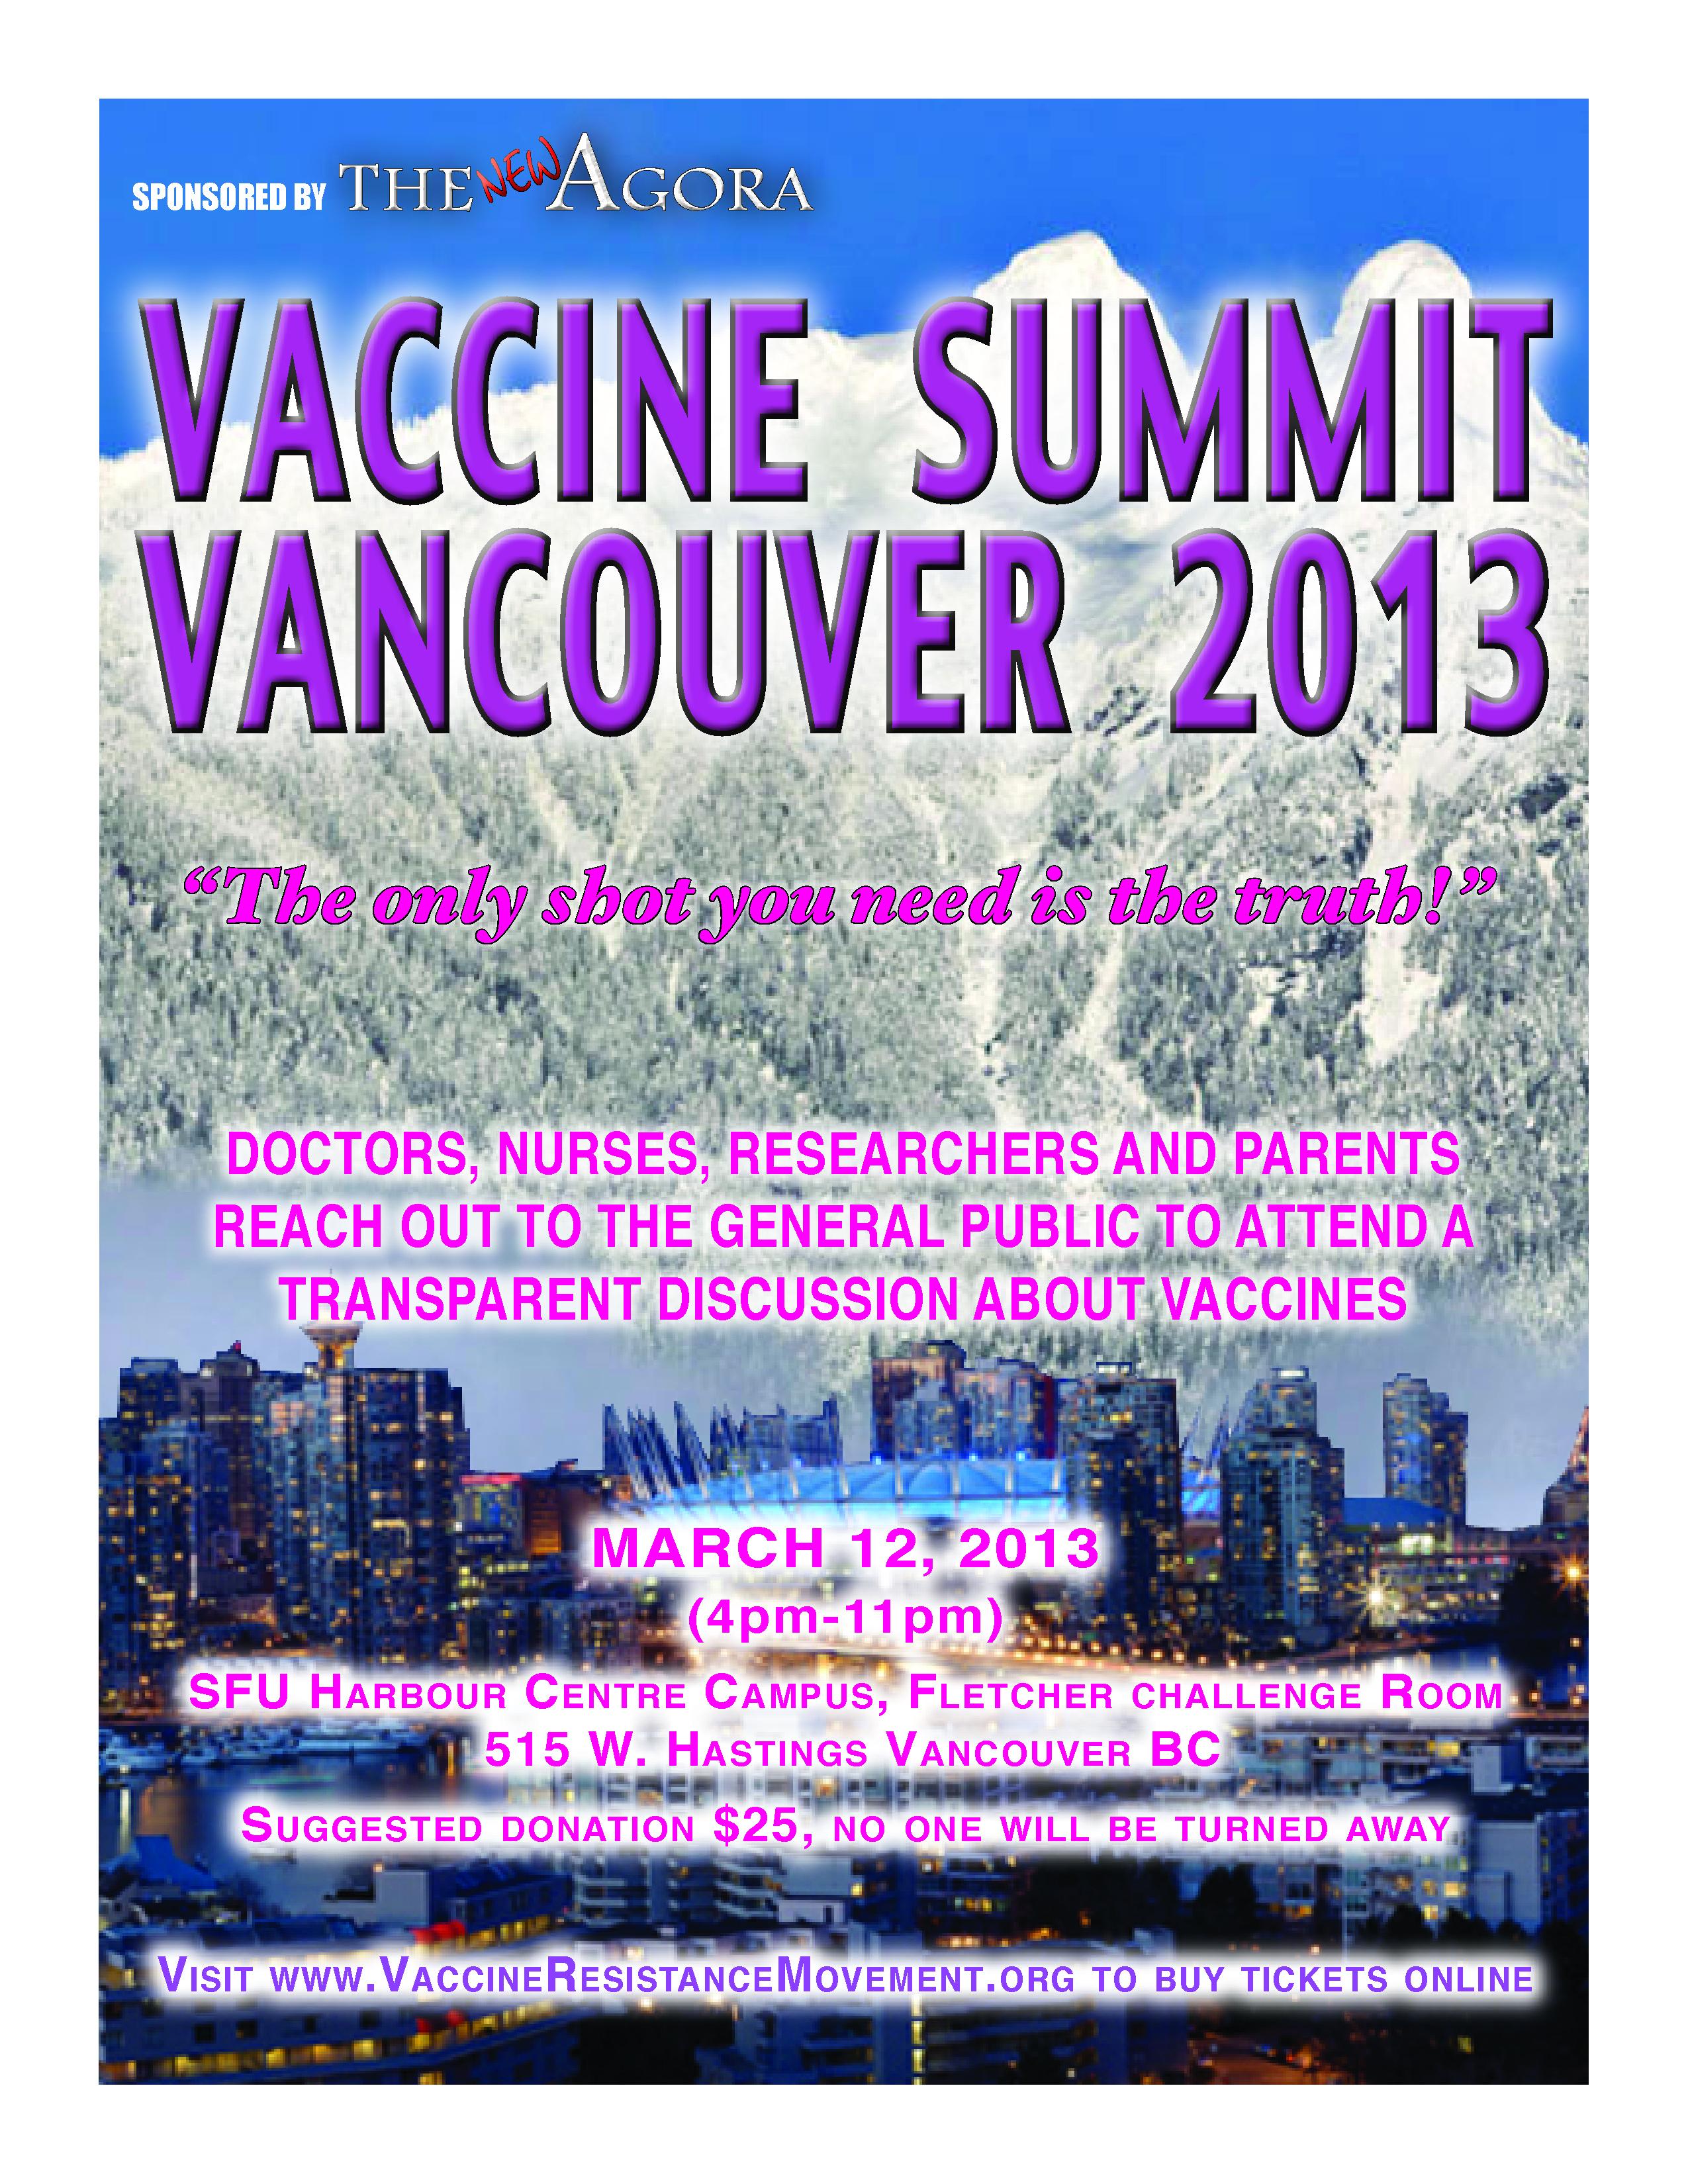 Vaccine Resistance Movement